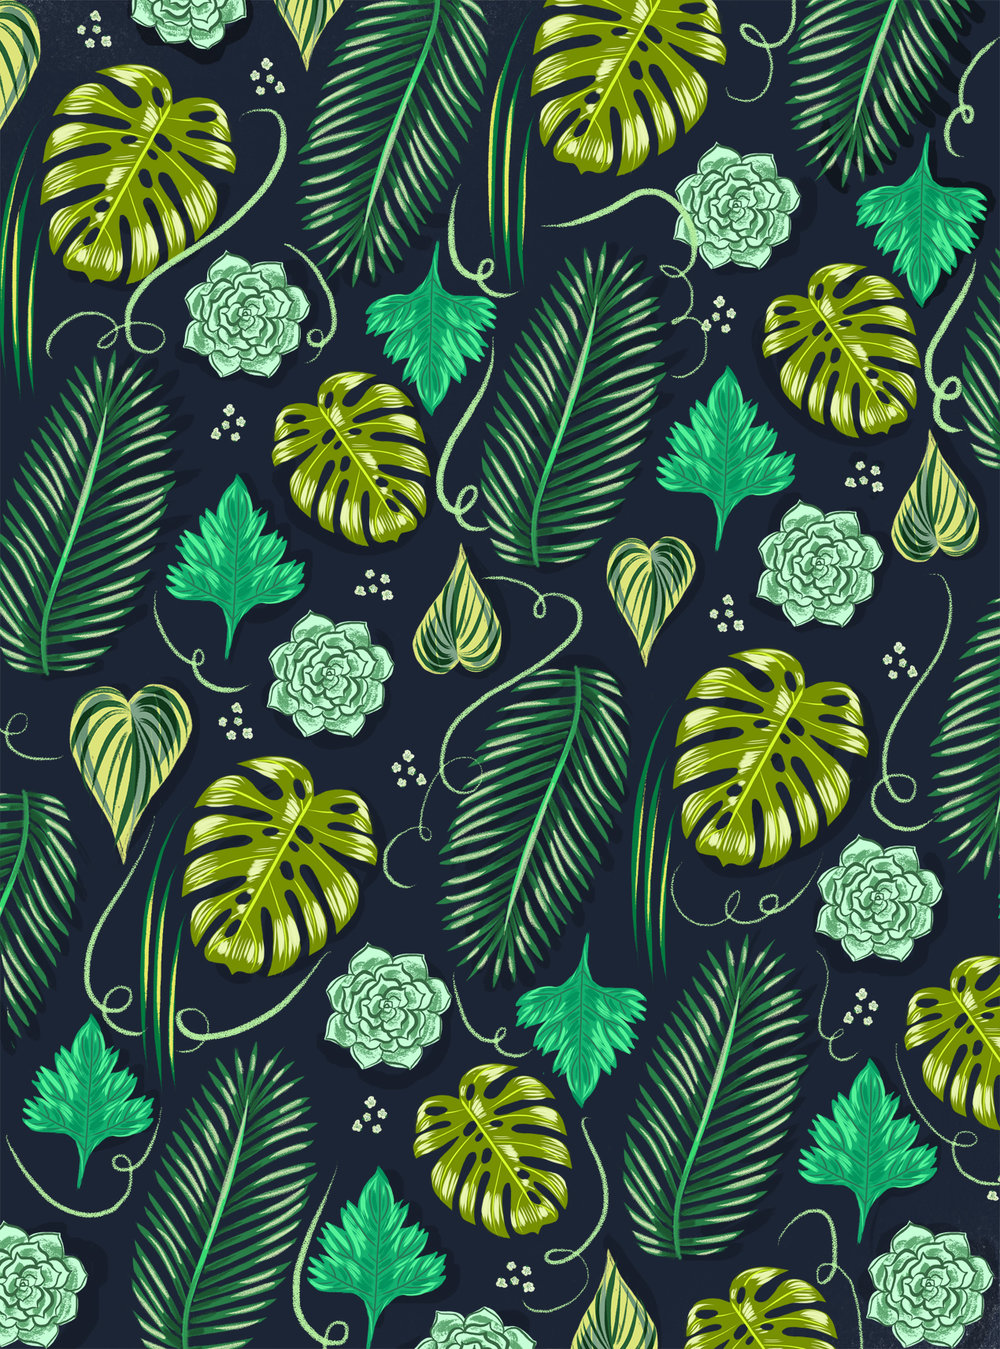 plant pattern-greener-sarahtanatjones.jpg